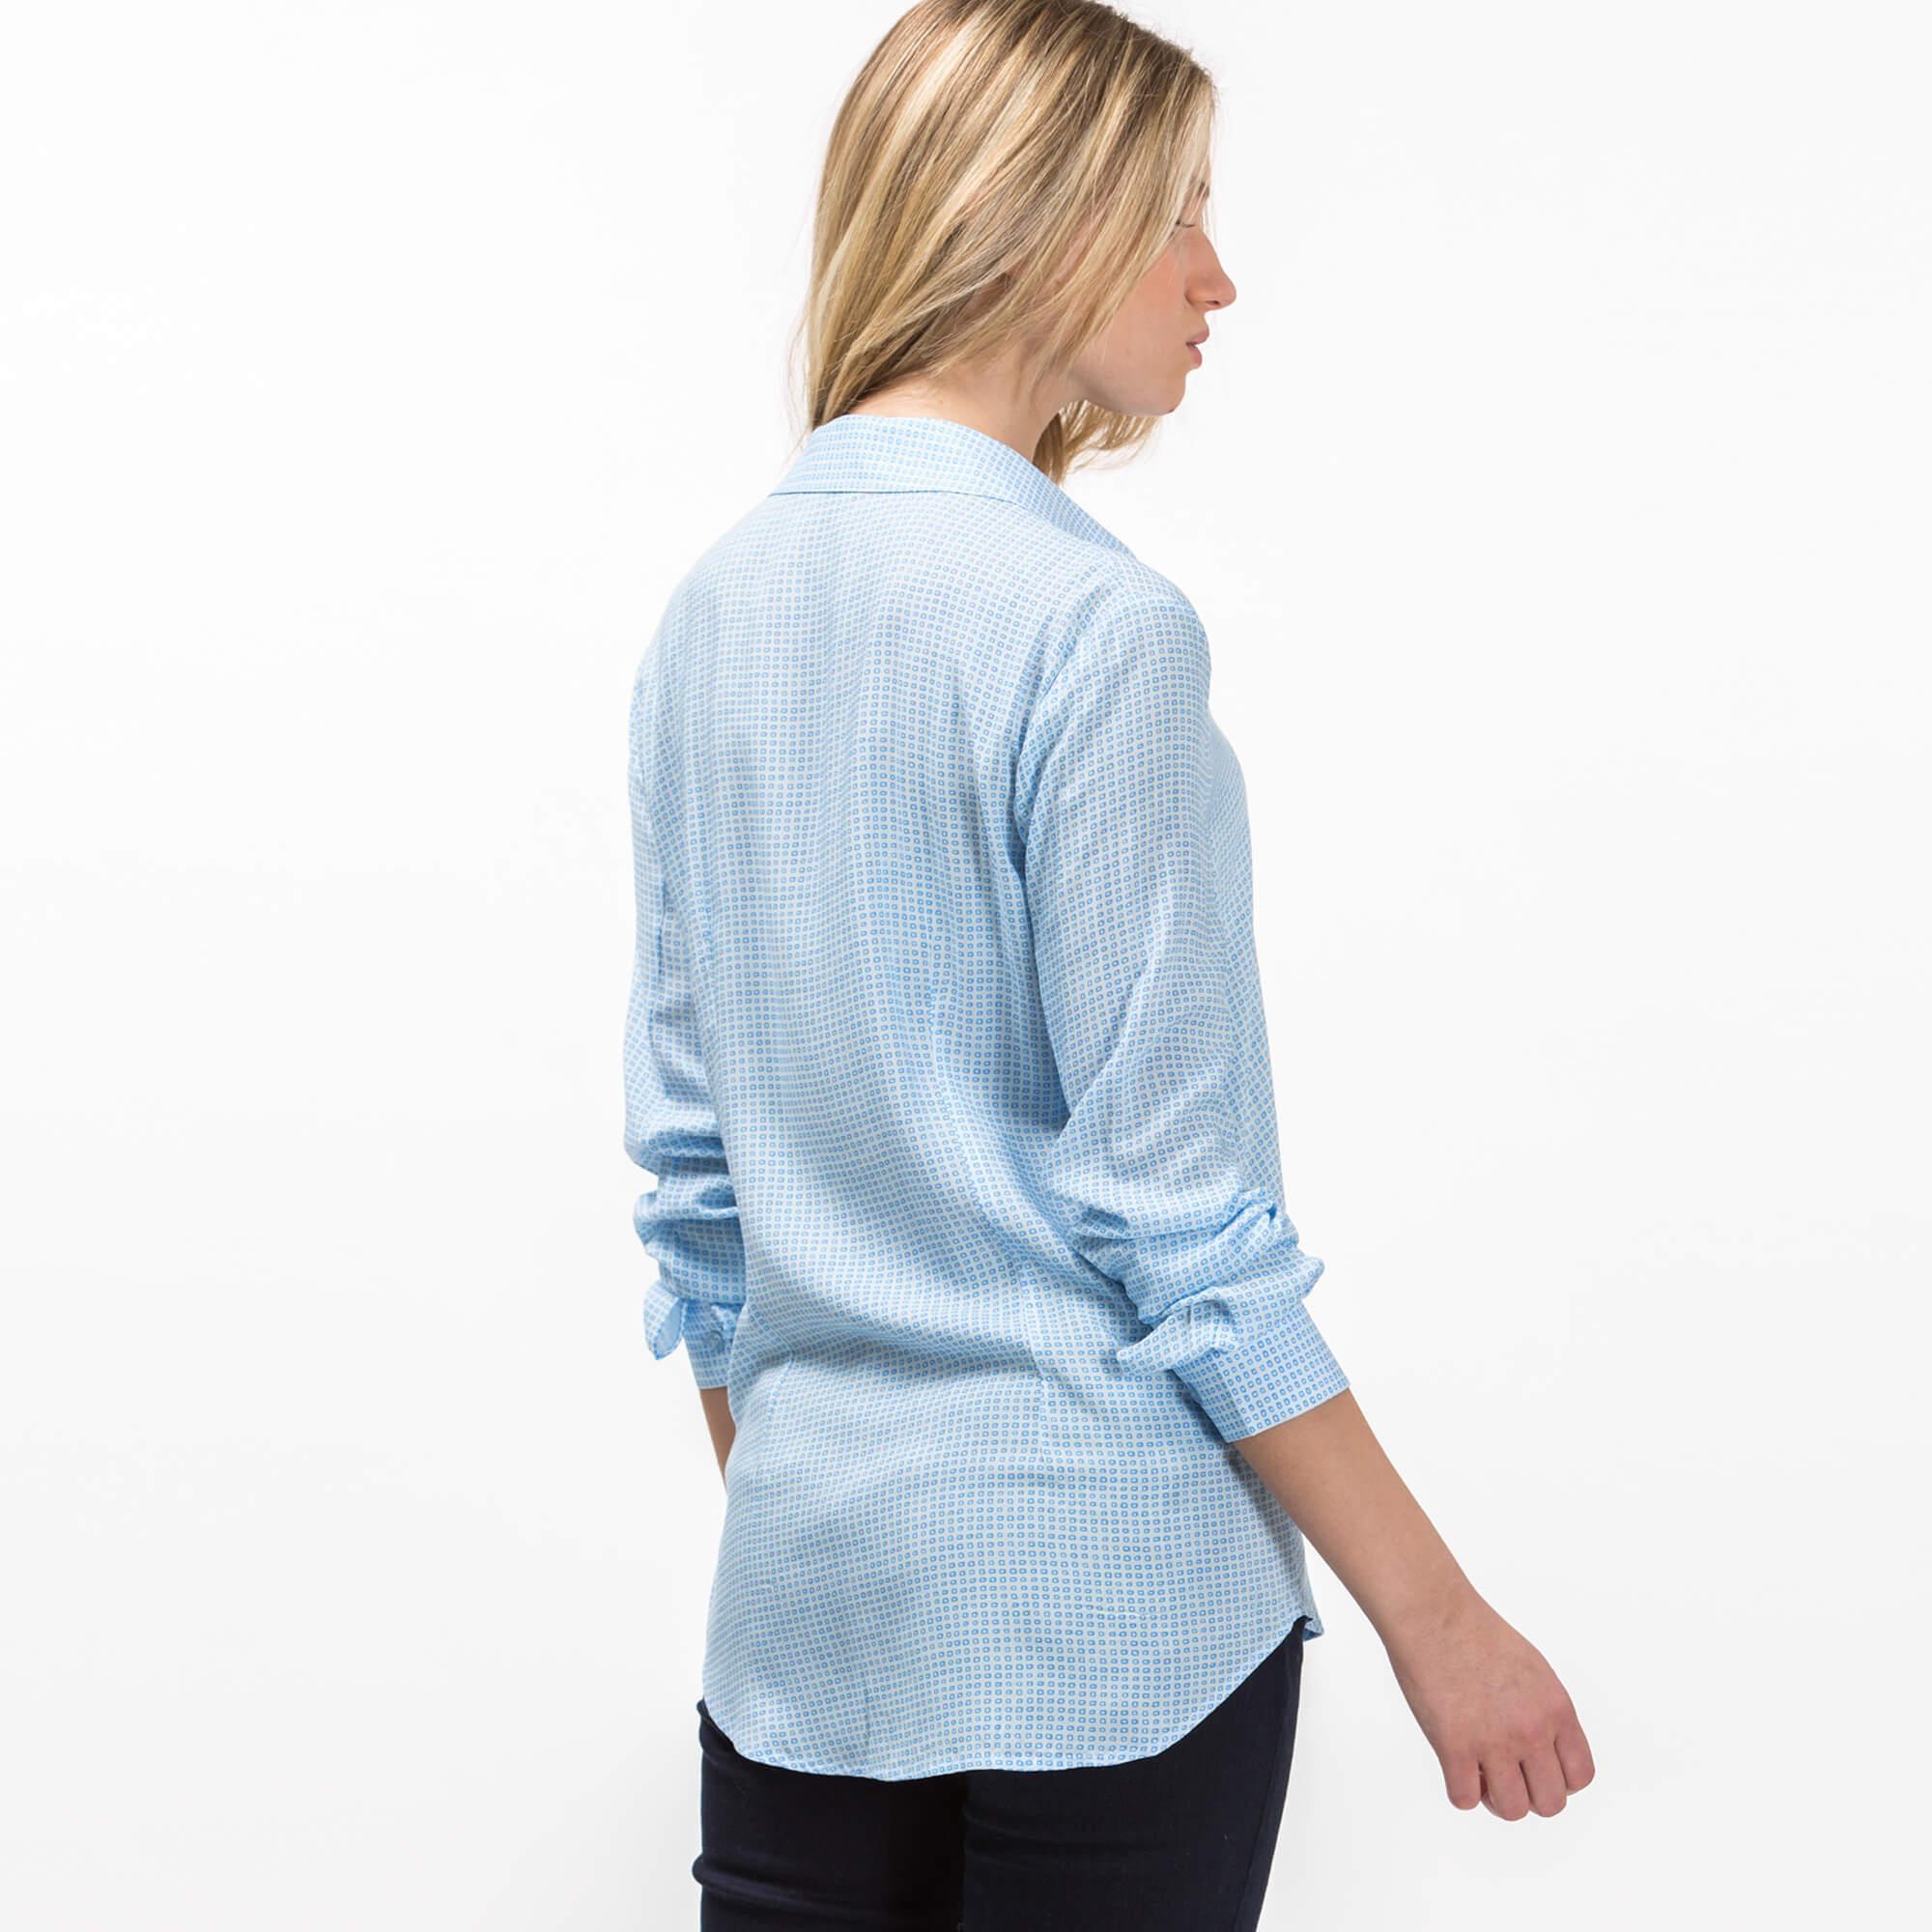 Lacoste Women's Long Sleeve Wovens Shirt